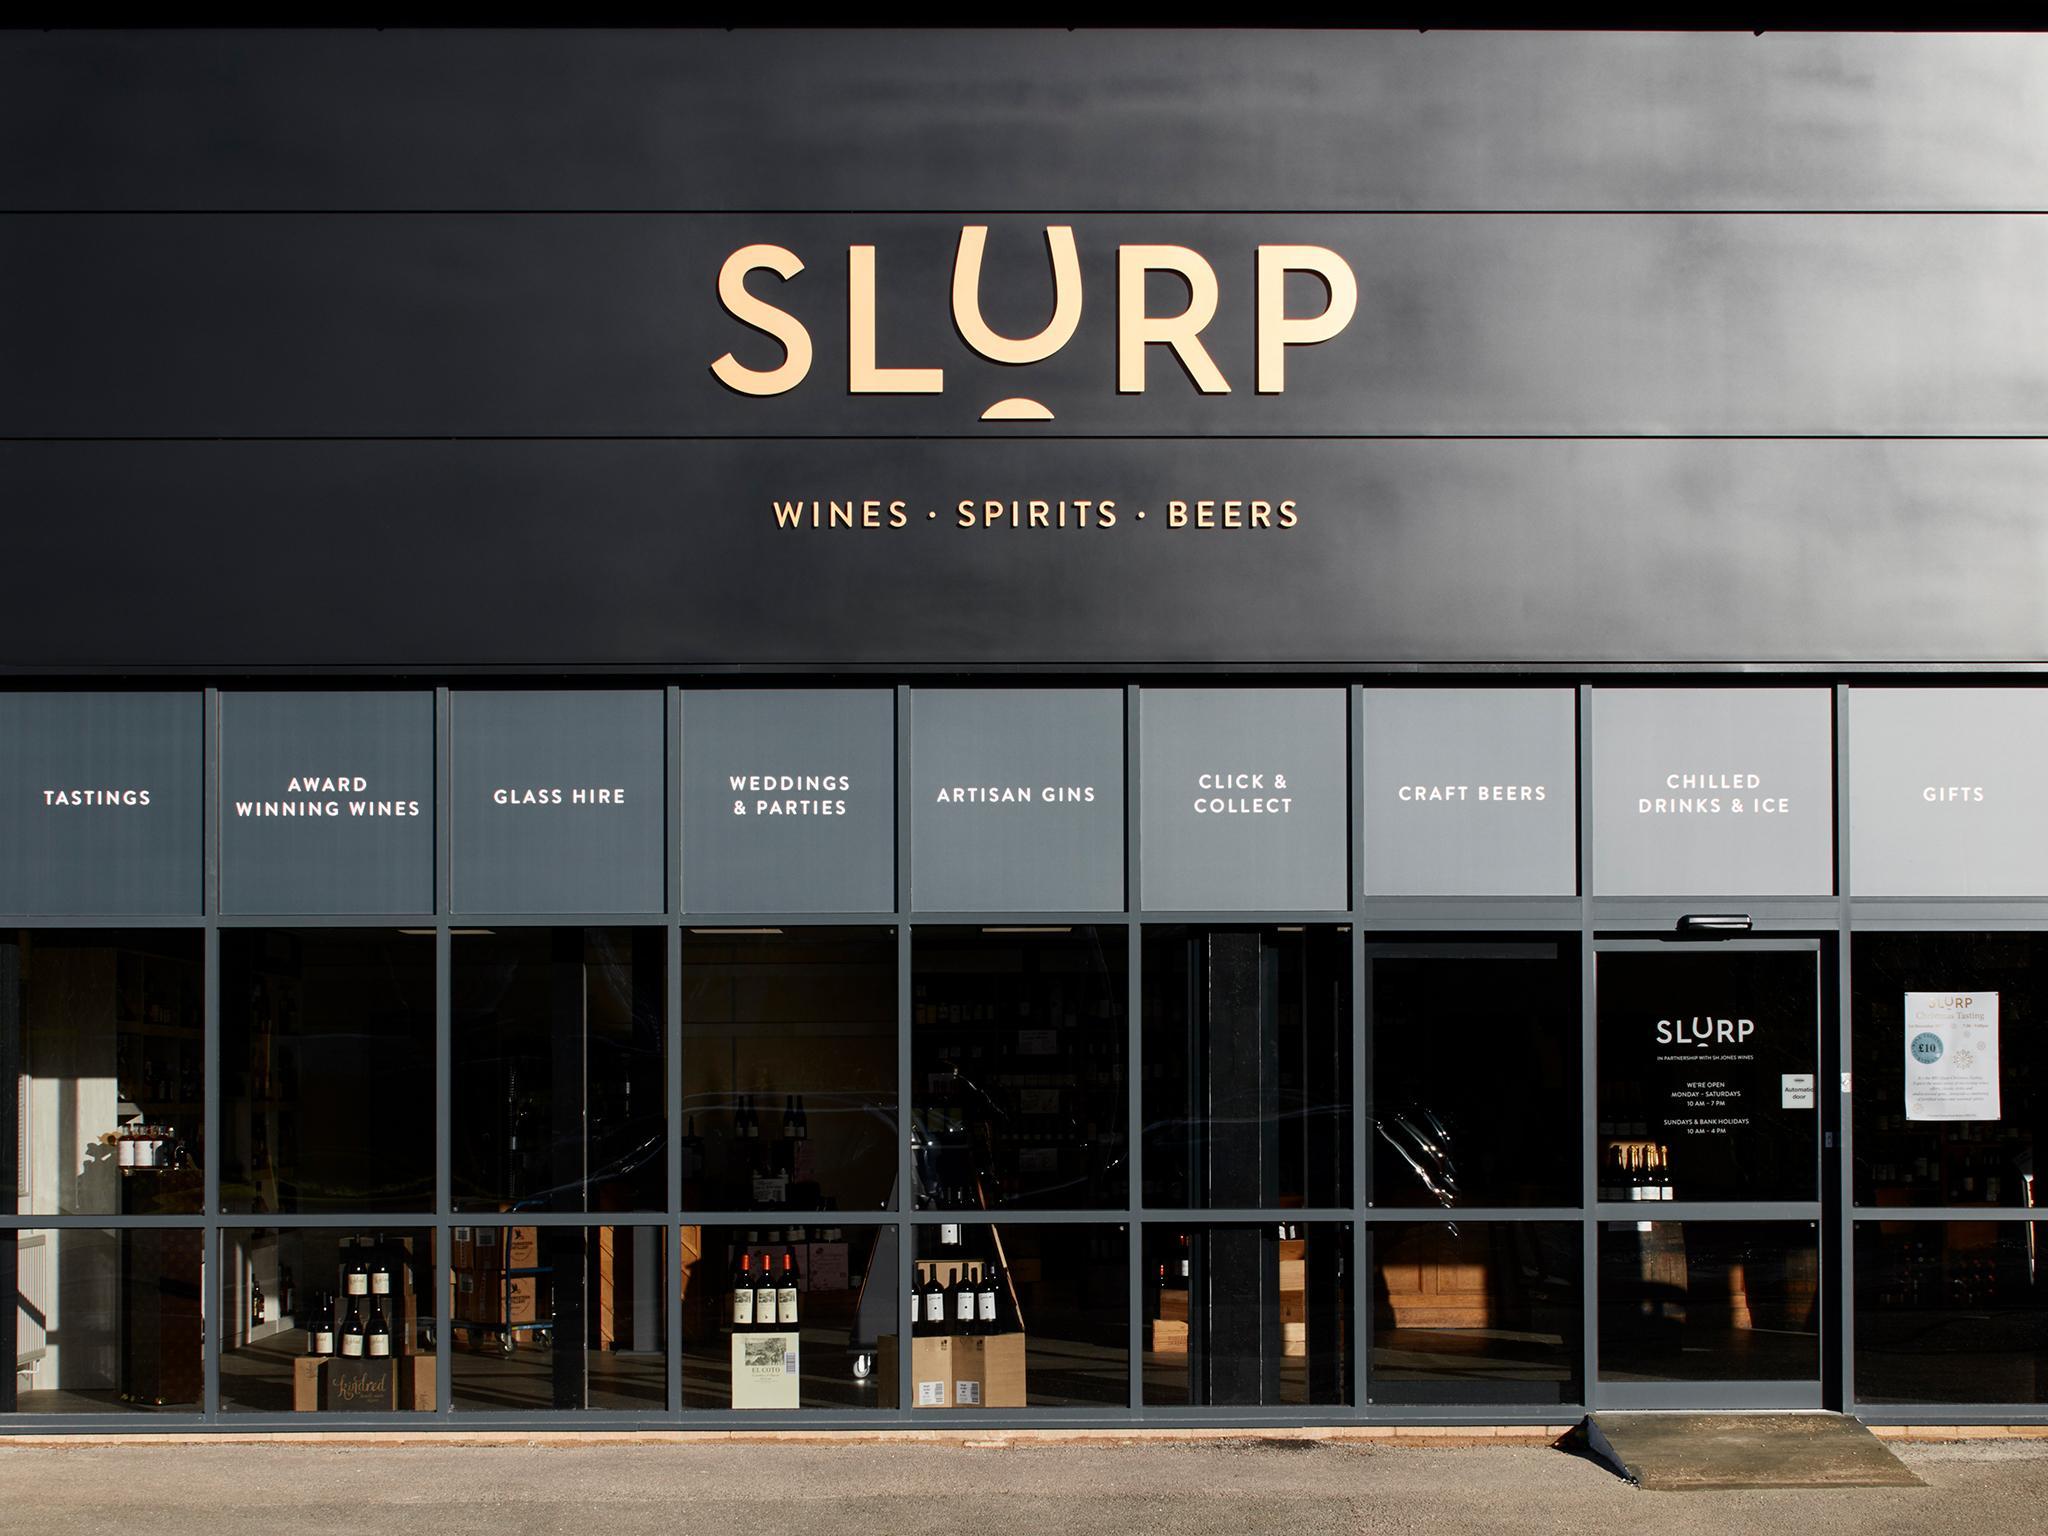 Best online wine shop: Enjoy red, white, sparkling or